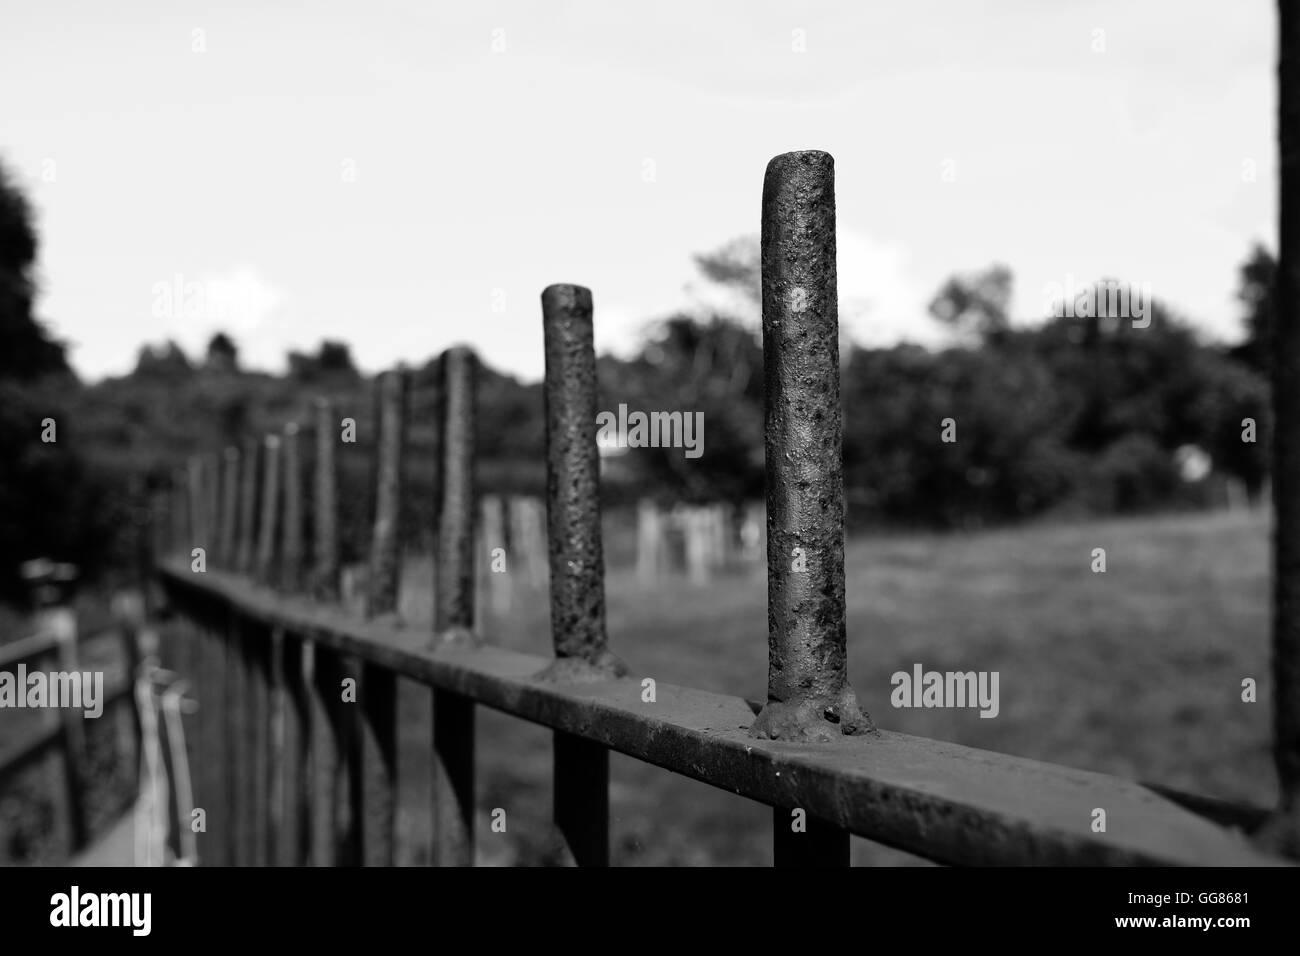 Black and white image metal railings in rural setting - Stock Image